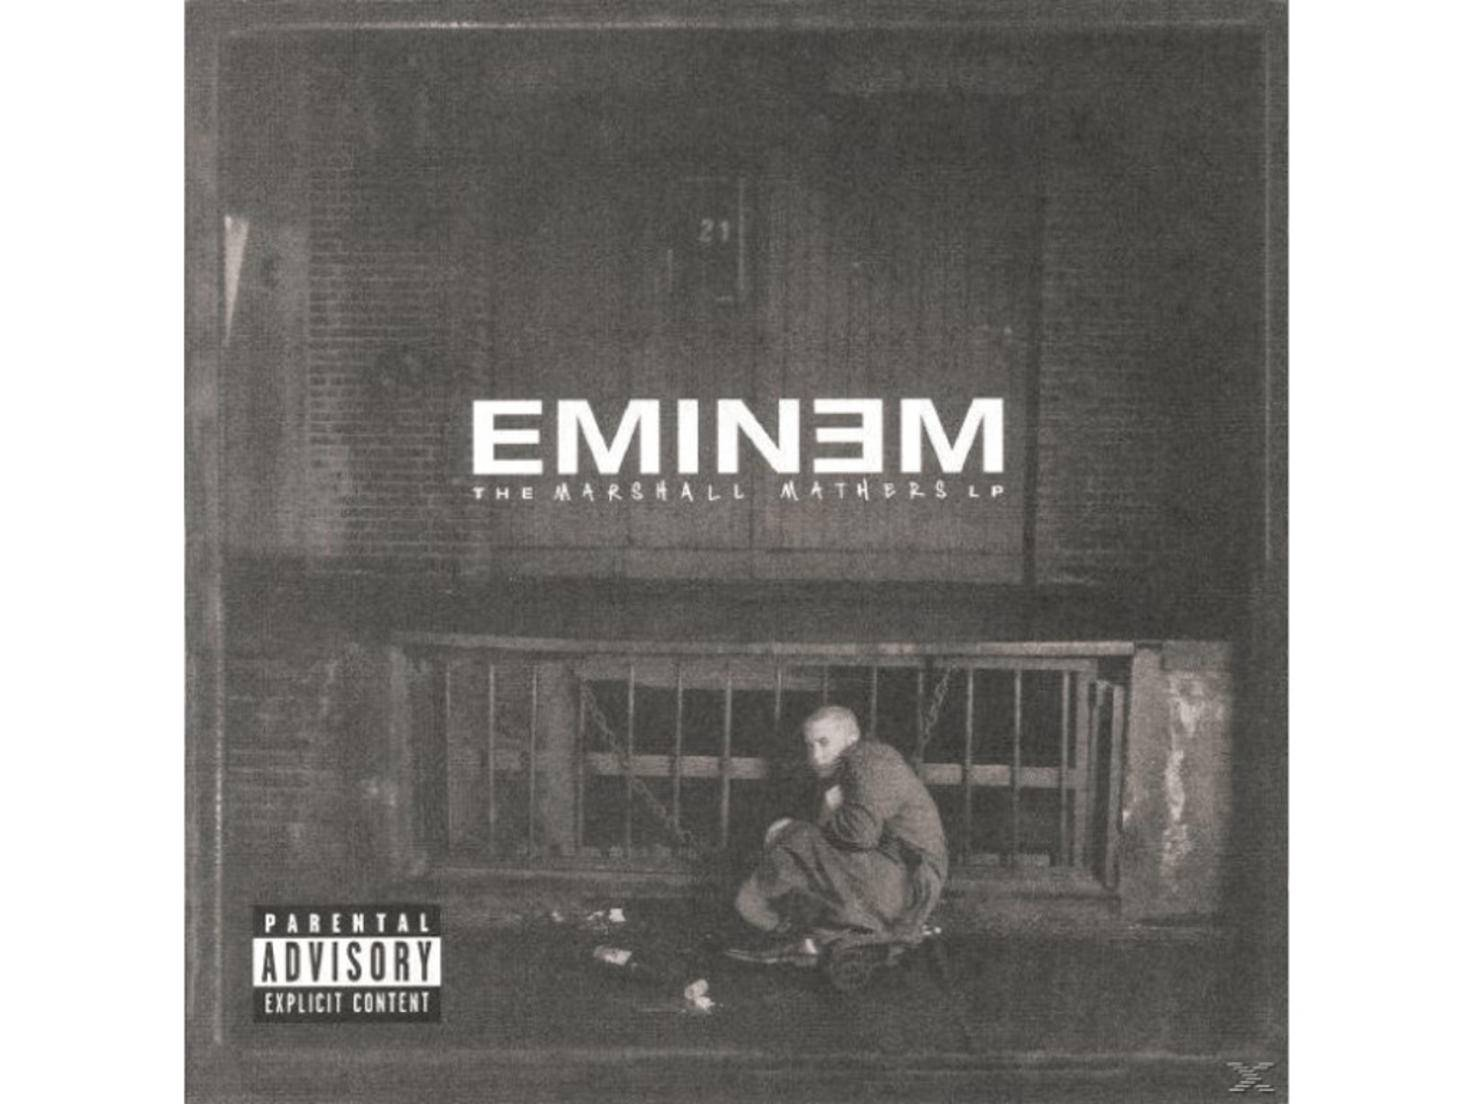 Eminem The Marshall Mathers LP.jpg